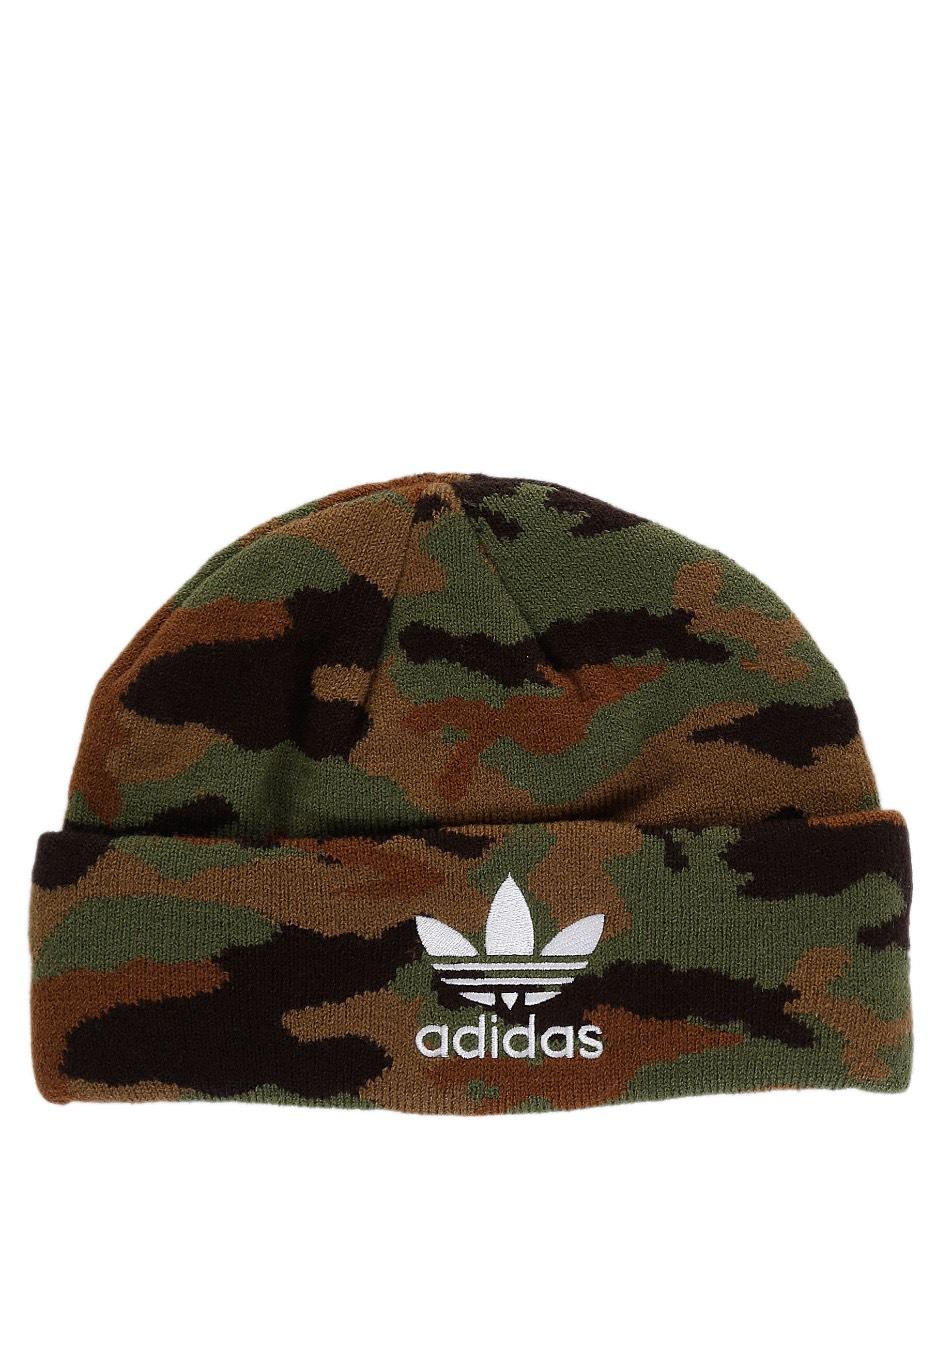 Adidas - Graphic Multicolor White - Beanie - Streetwear Shop -  Impericon.com UK 69ef1b9f111